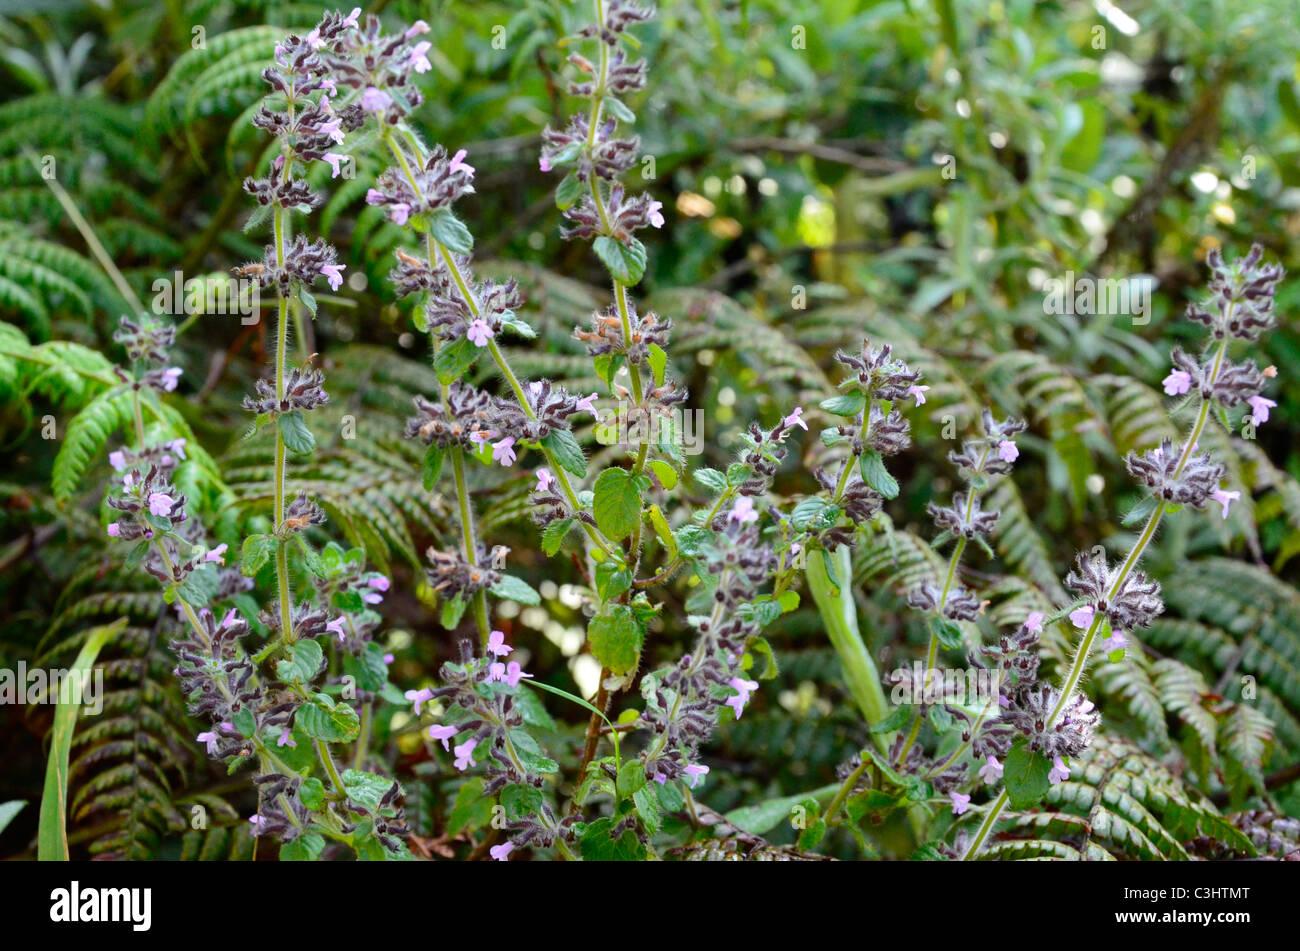 Alpine flowers on Mount Nyiragongo in Virunga National Park, eastern Democratic Republic of Congo. - Stock Image